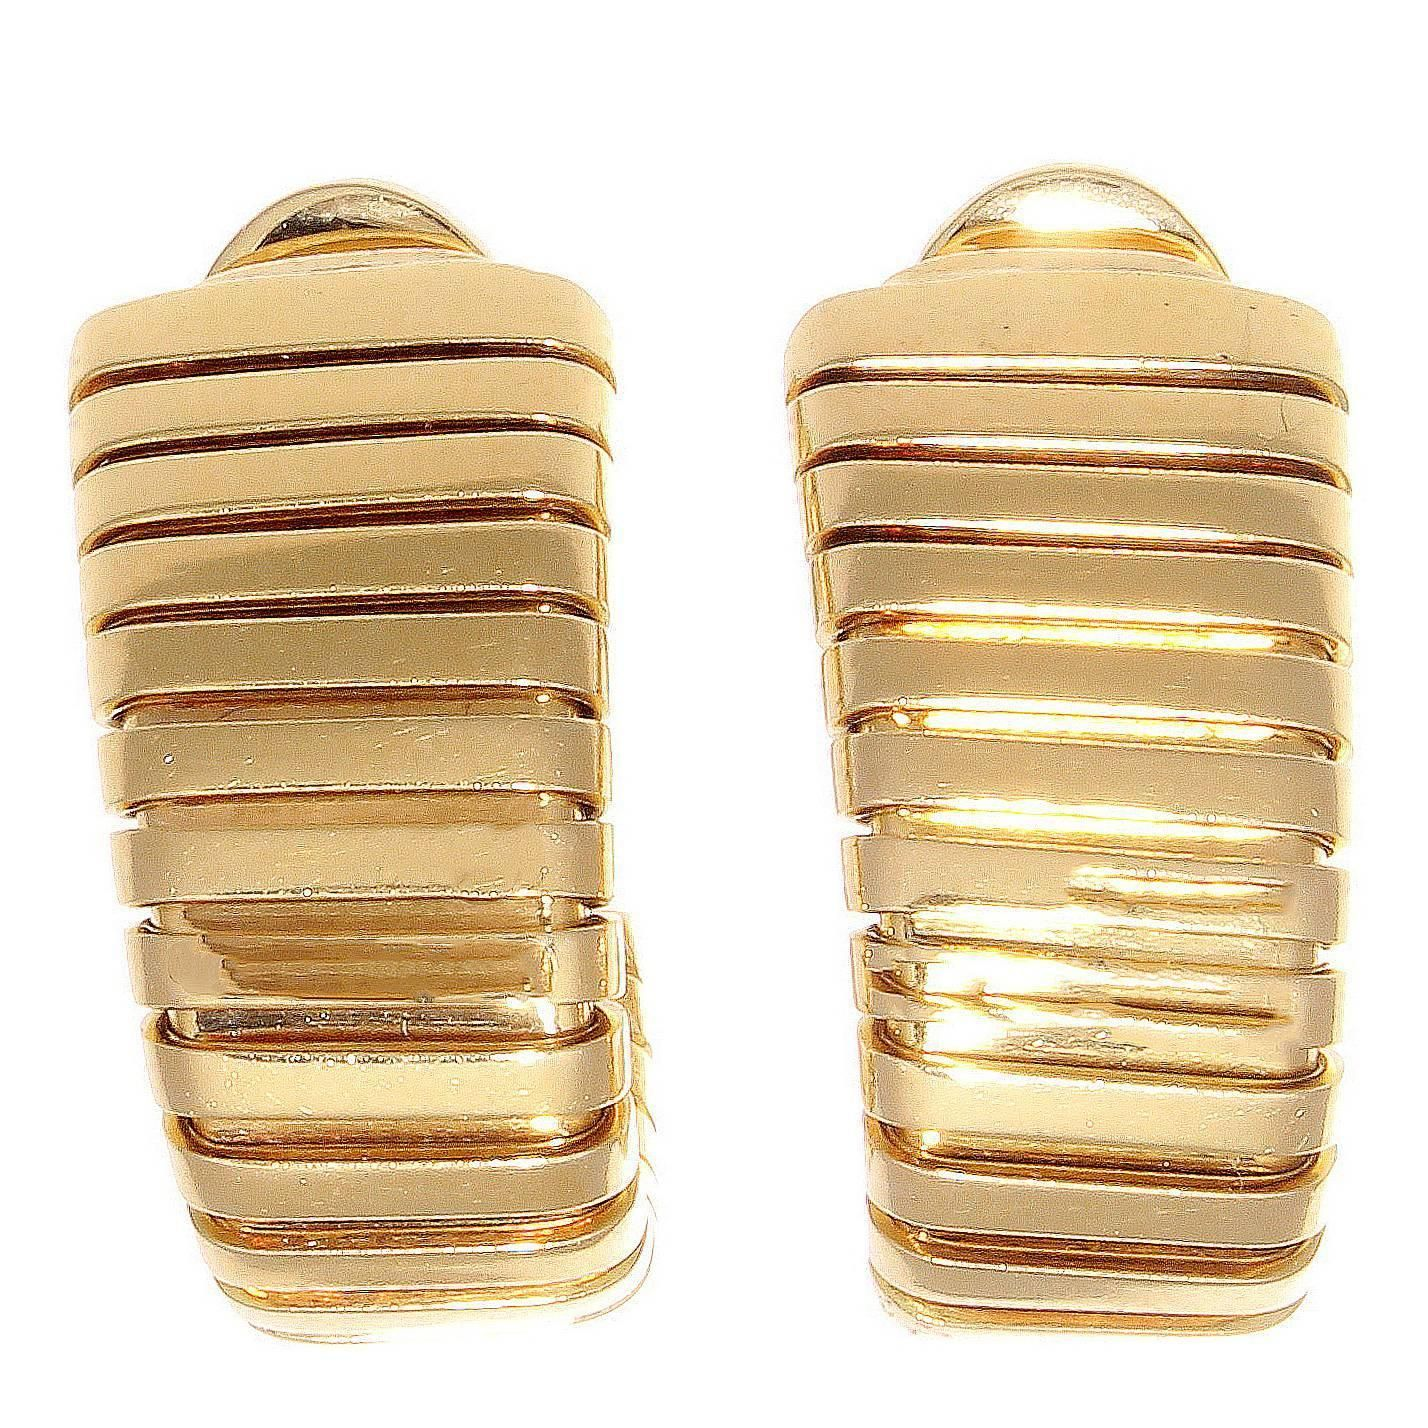 Bulgari Tubogas Gold Earrings 18 Karat Gold Jewelry Gold Earrings Fine Pearl Jewelry